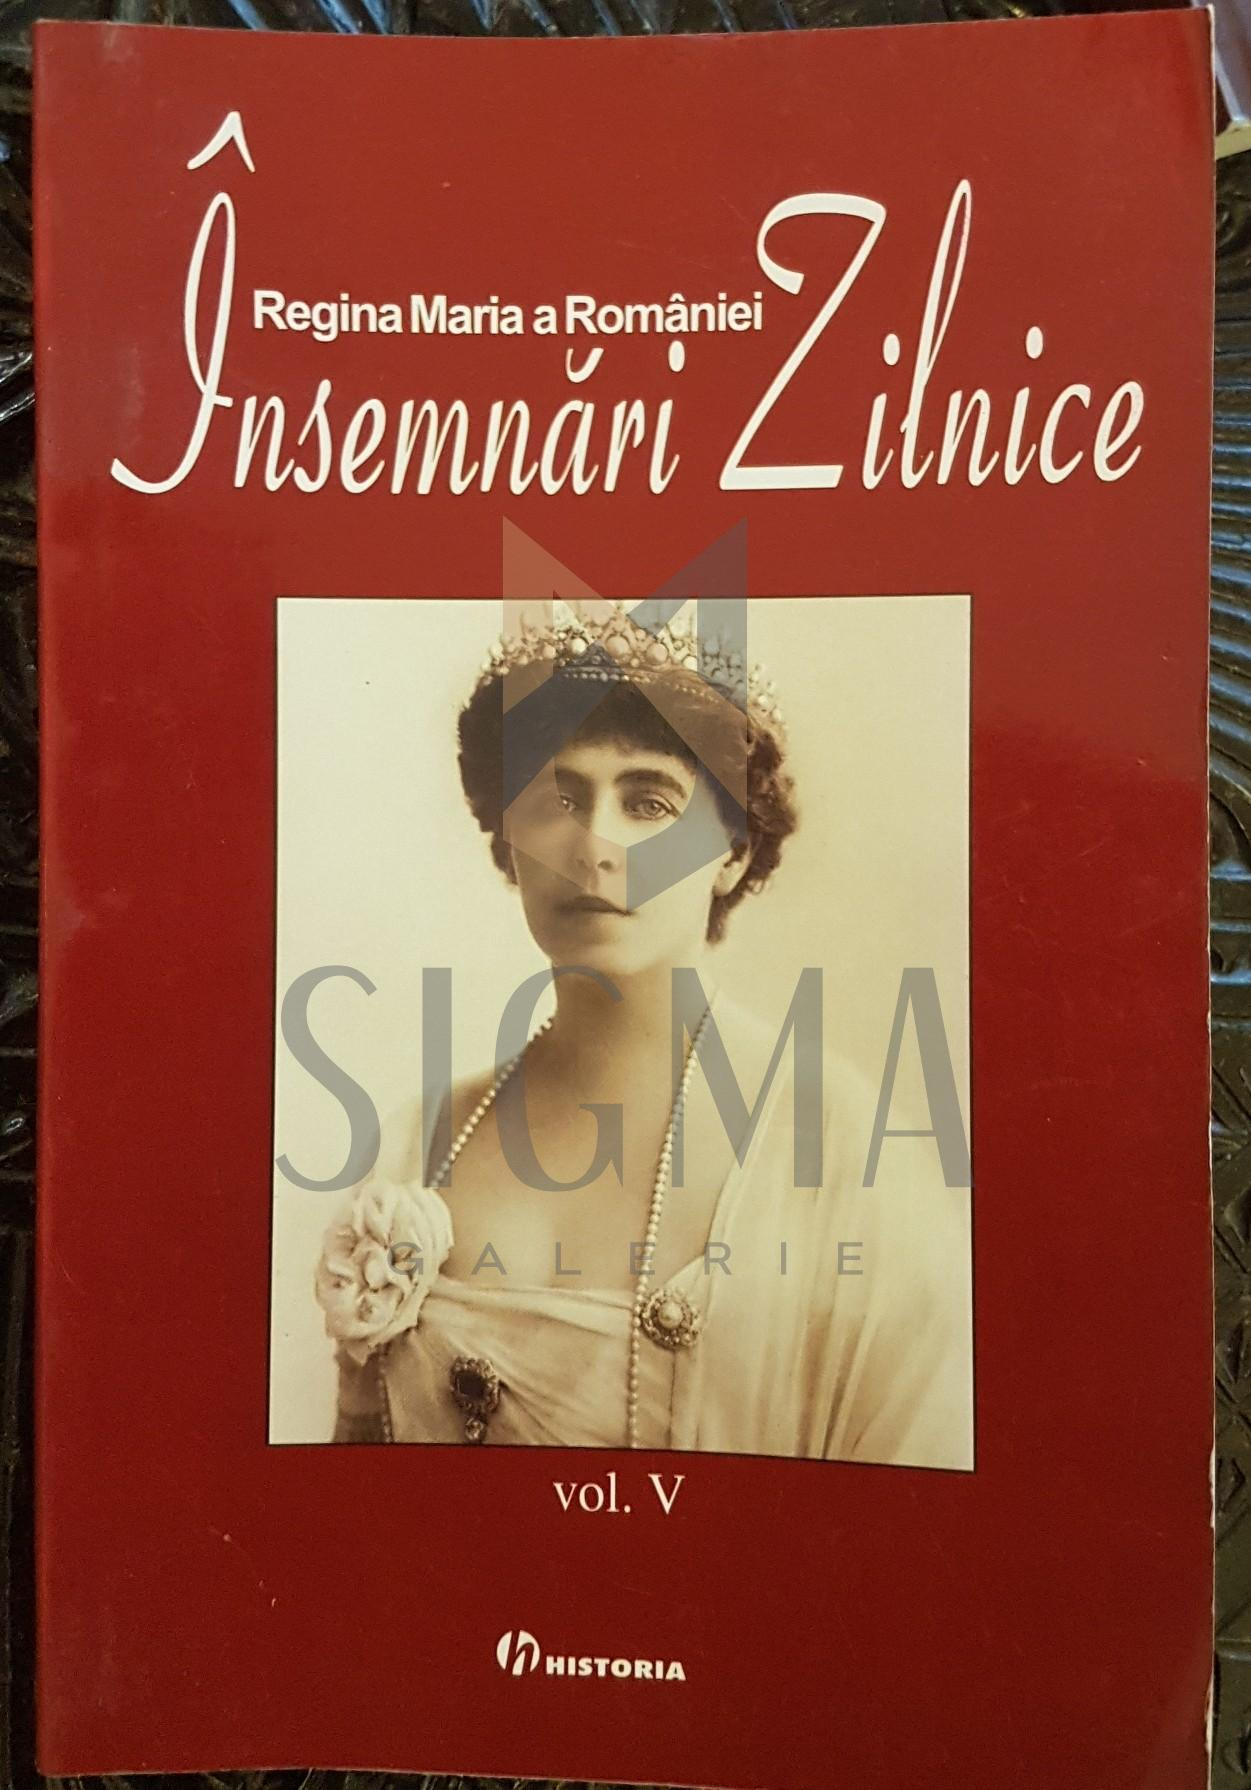 MARIA, REGINA ROMANIEI, INSEMNARI ZILNICE (Volumul V), 2006, Bucuresti